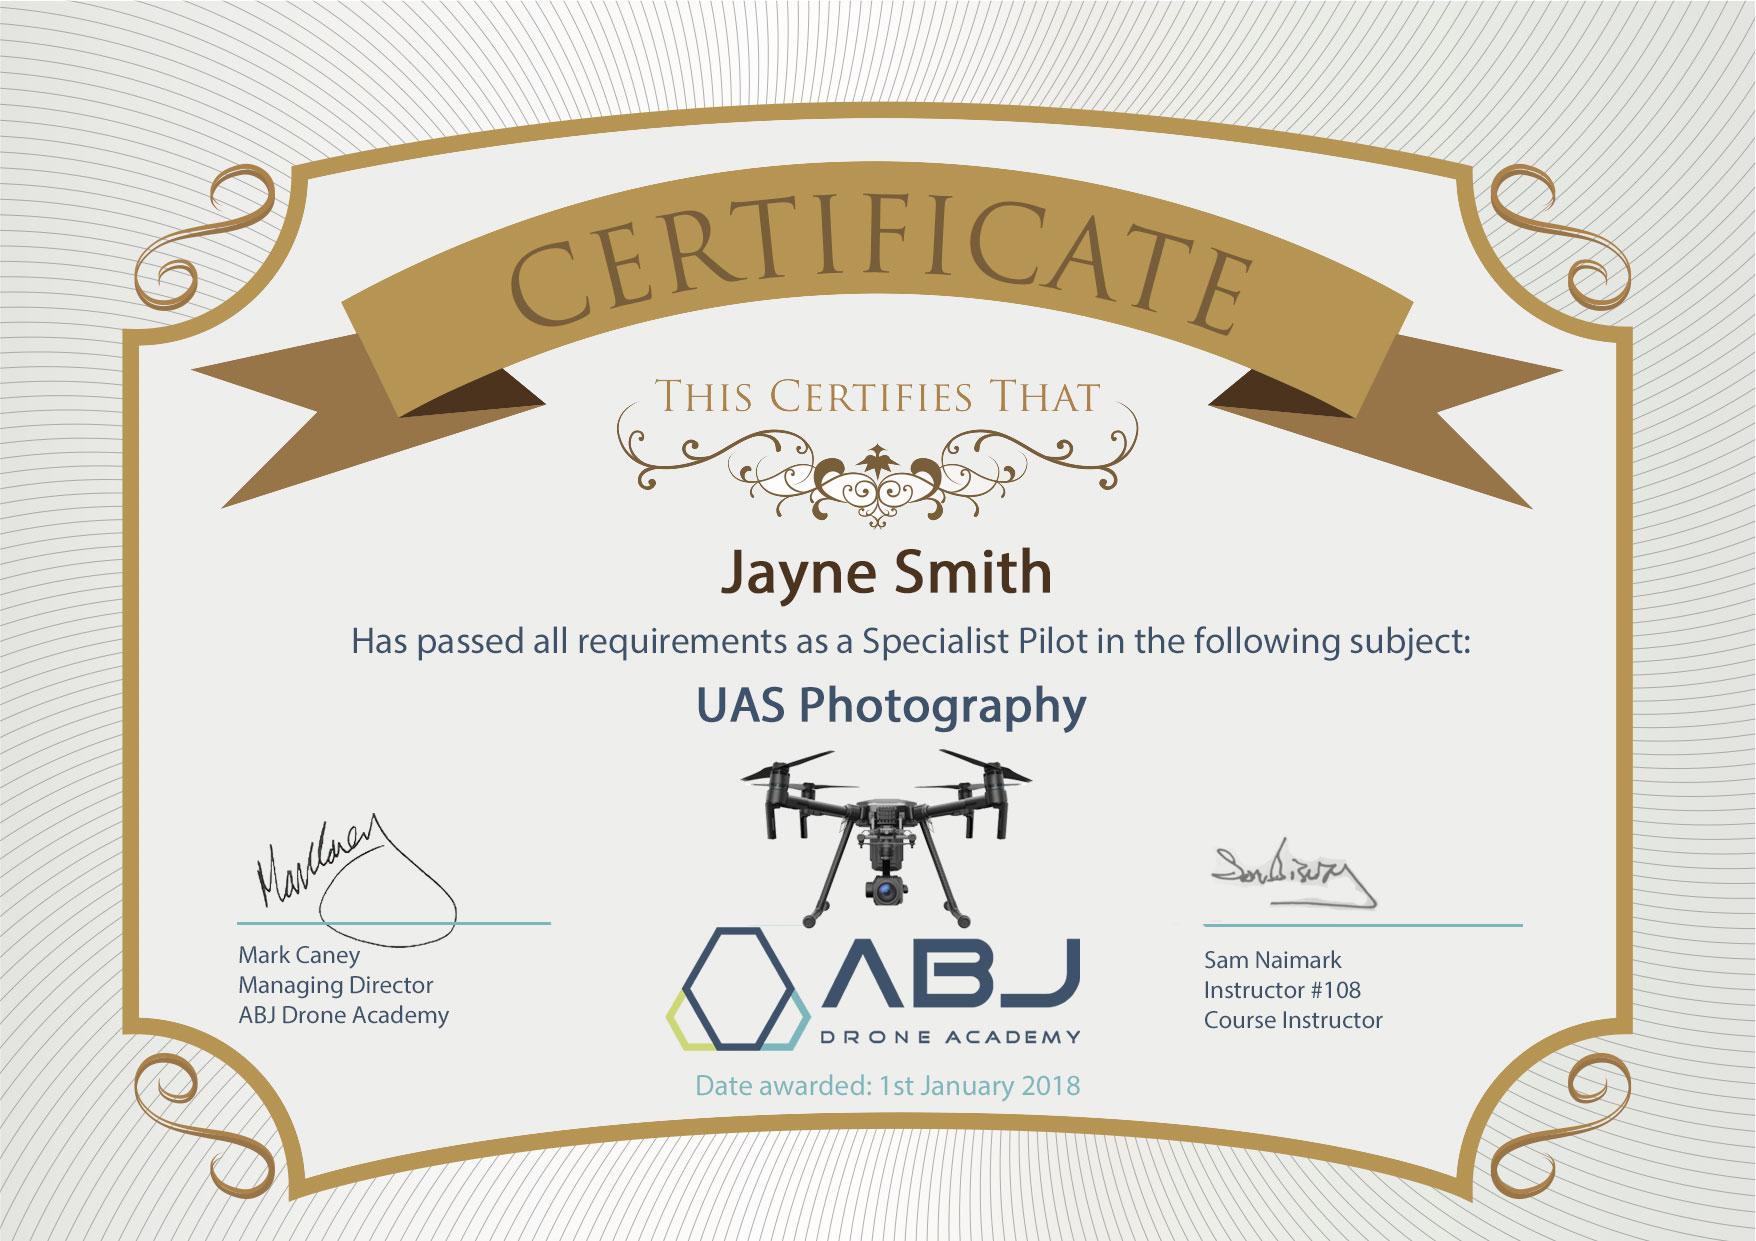 Abj Drone Academy Specialist Certificate Abj Drone Academy